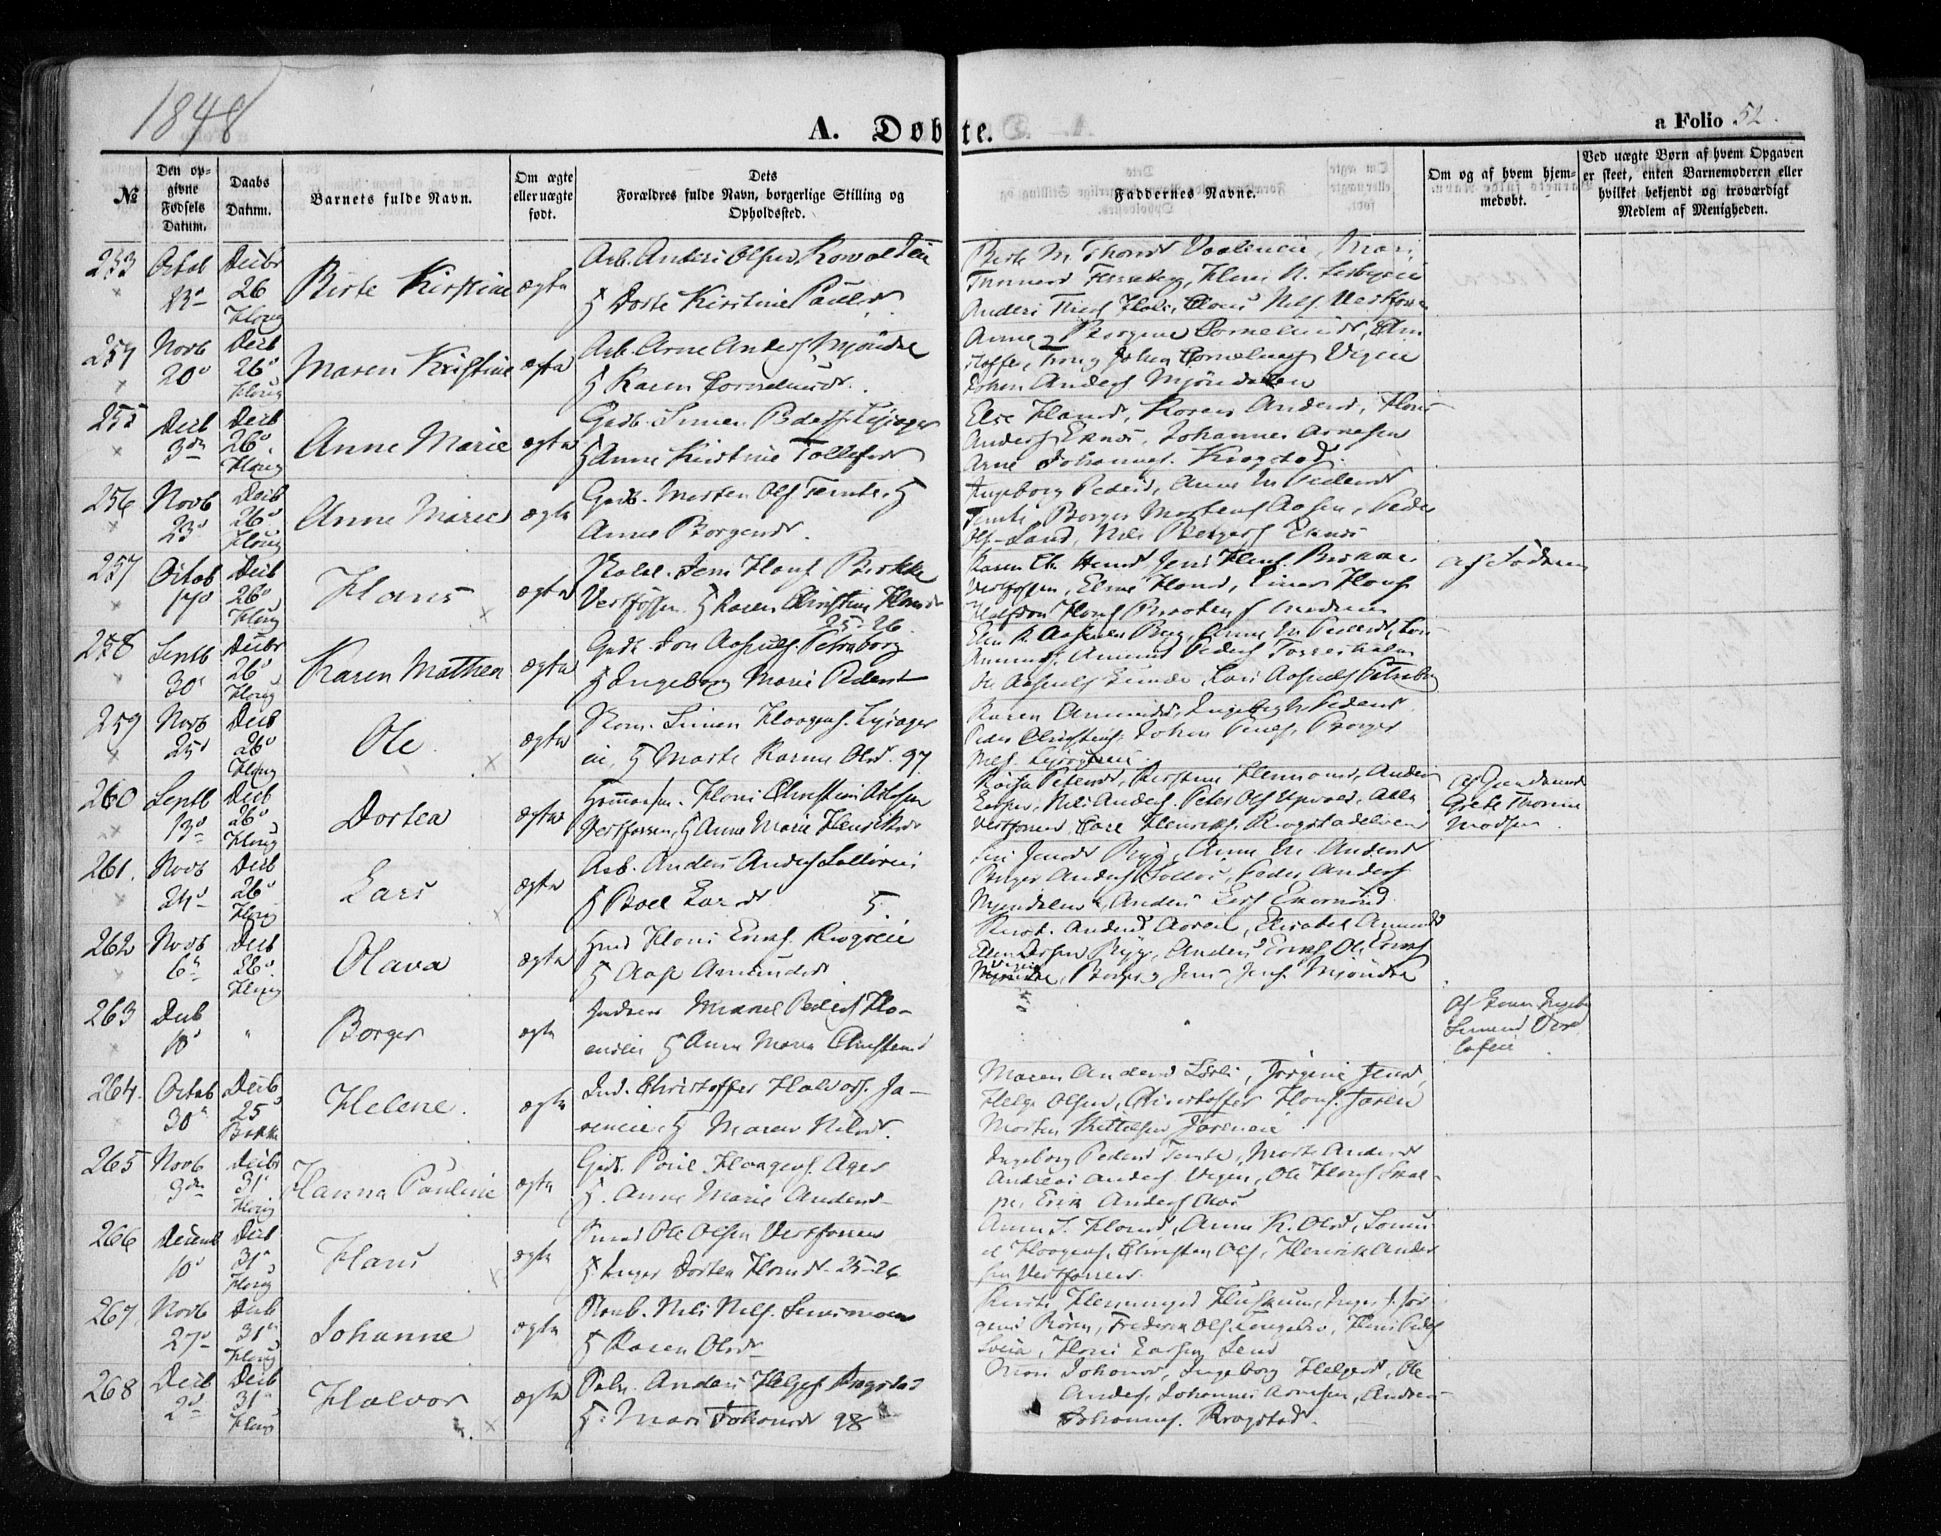 SAKO, Eiker kirkebøker, F/Fa/L0014: Ministerialbok nr. I 14, 1846-1854, s. 52